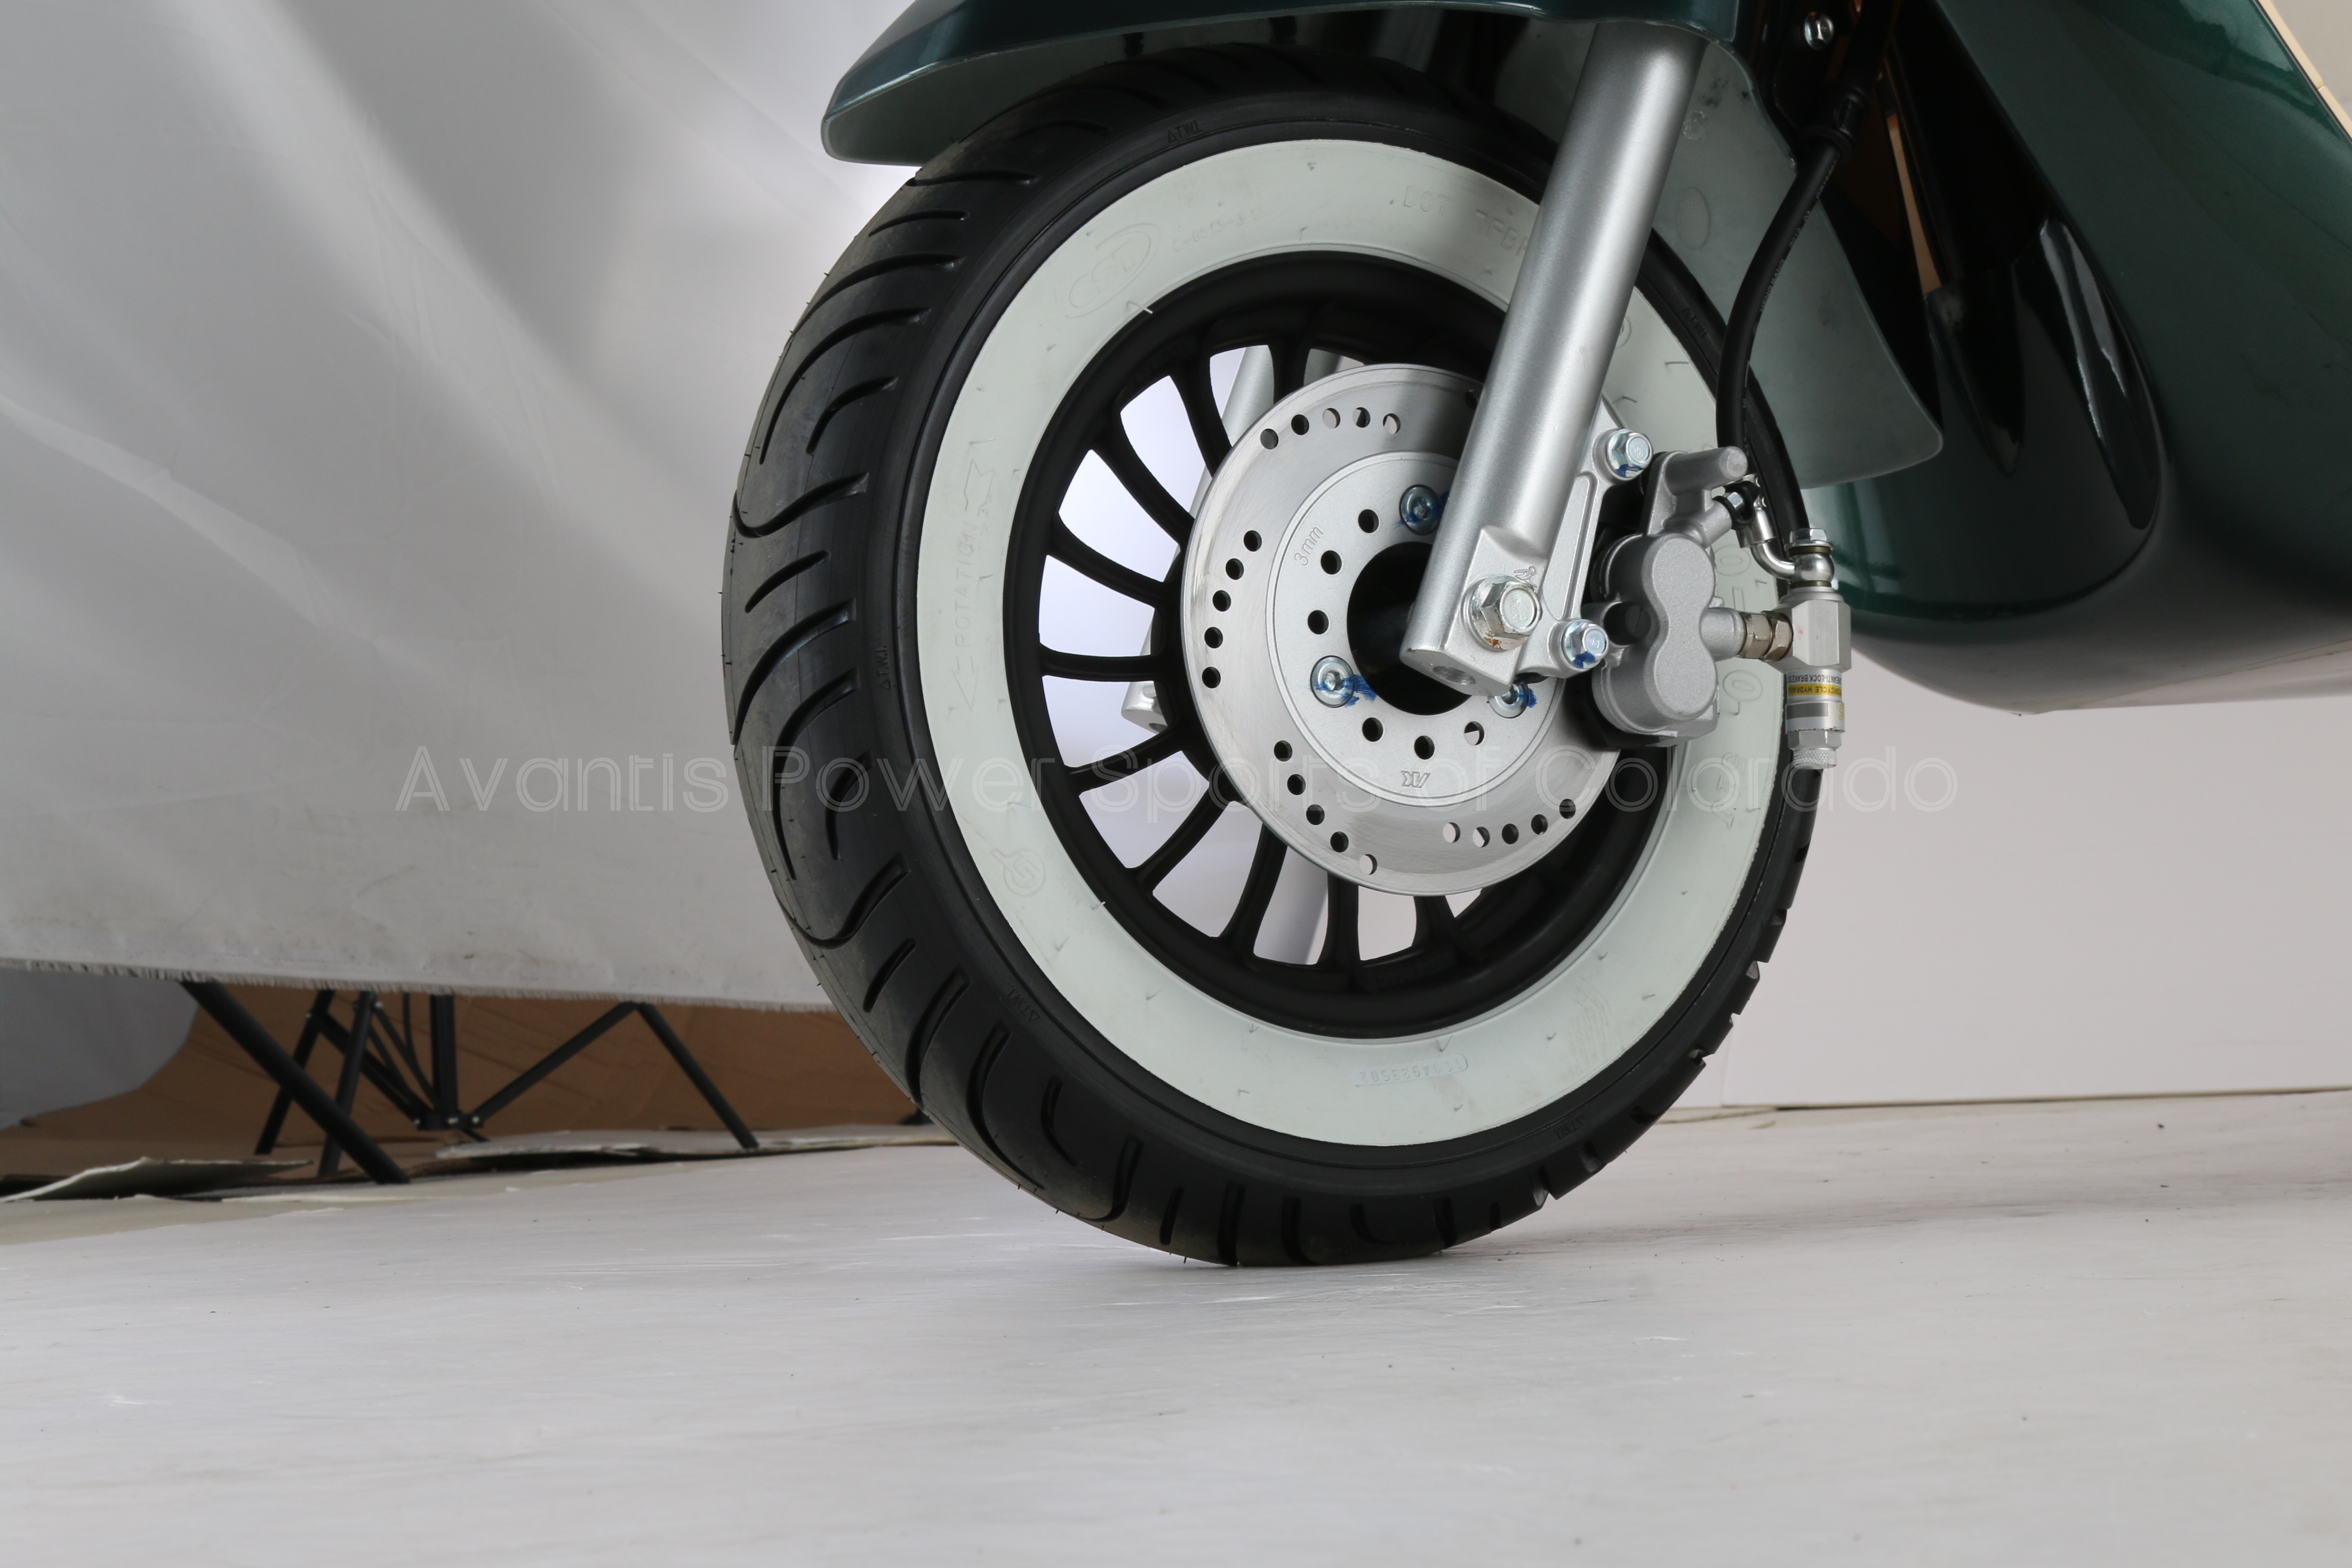 avenza-front-wheel